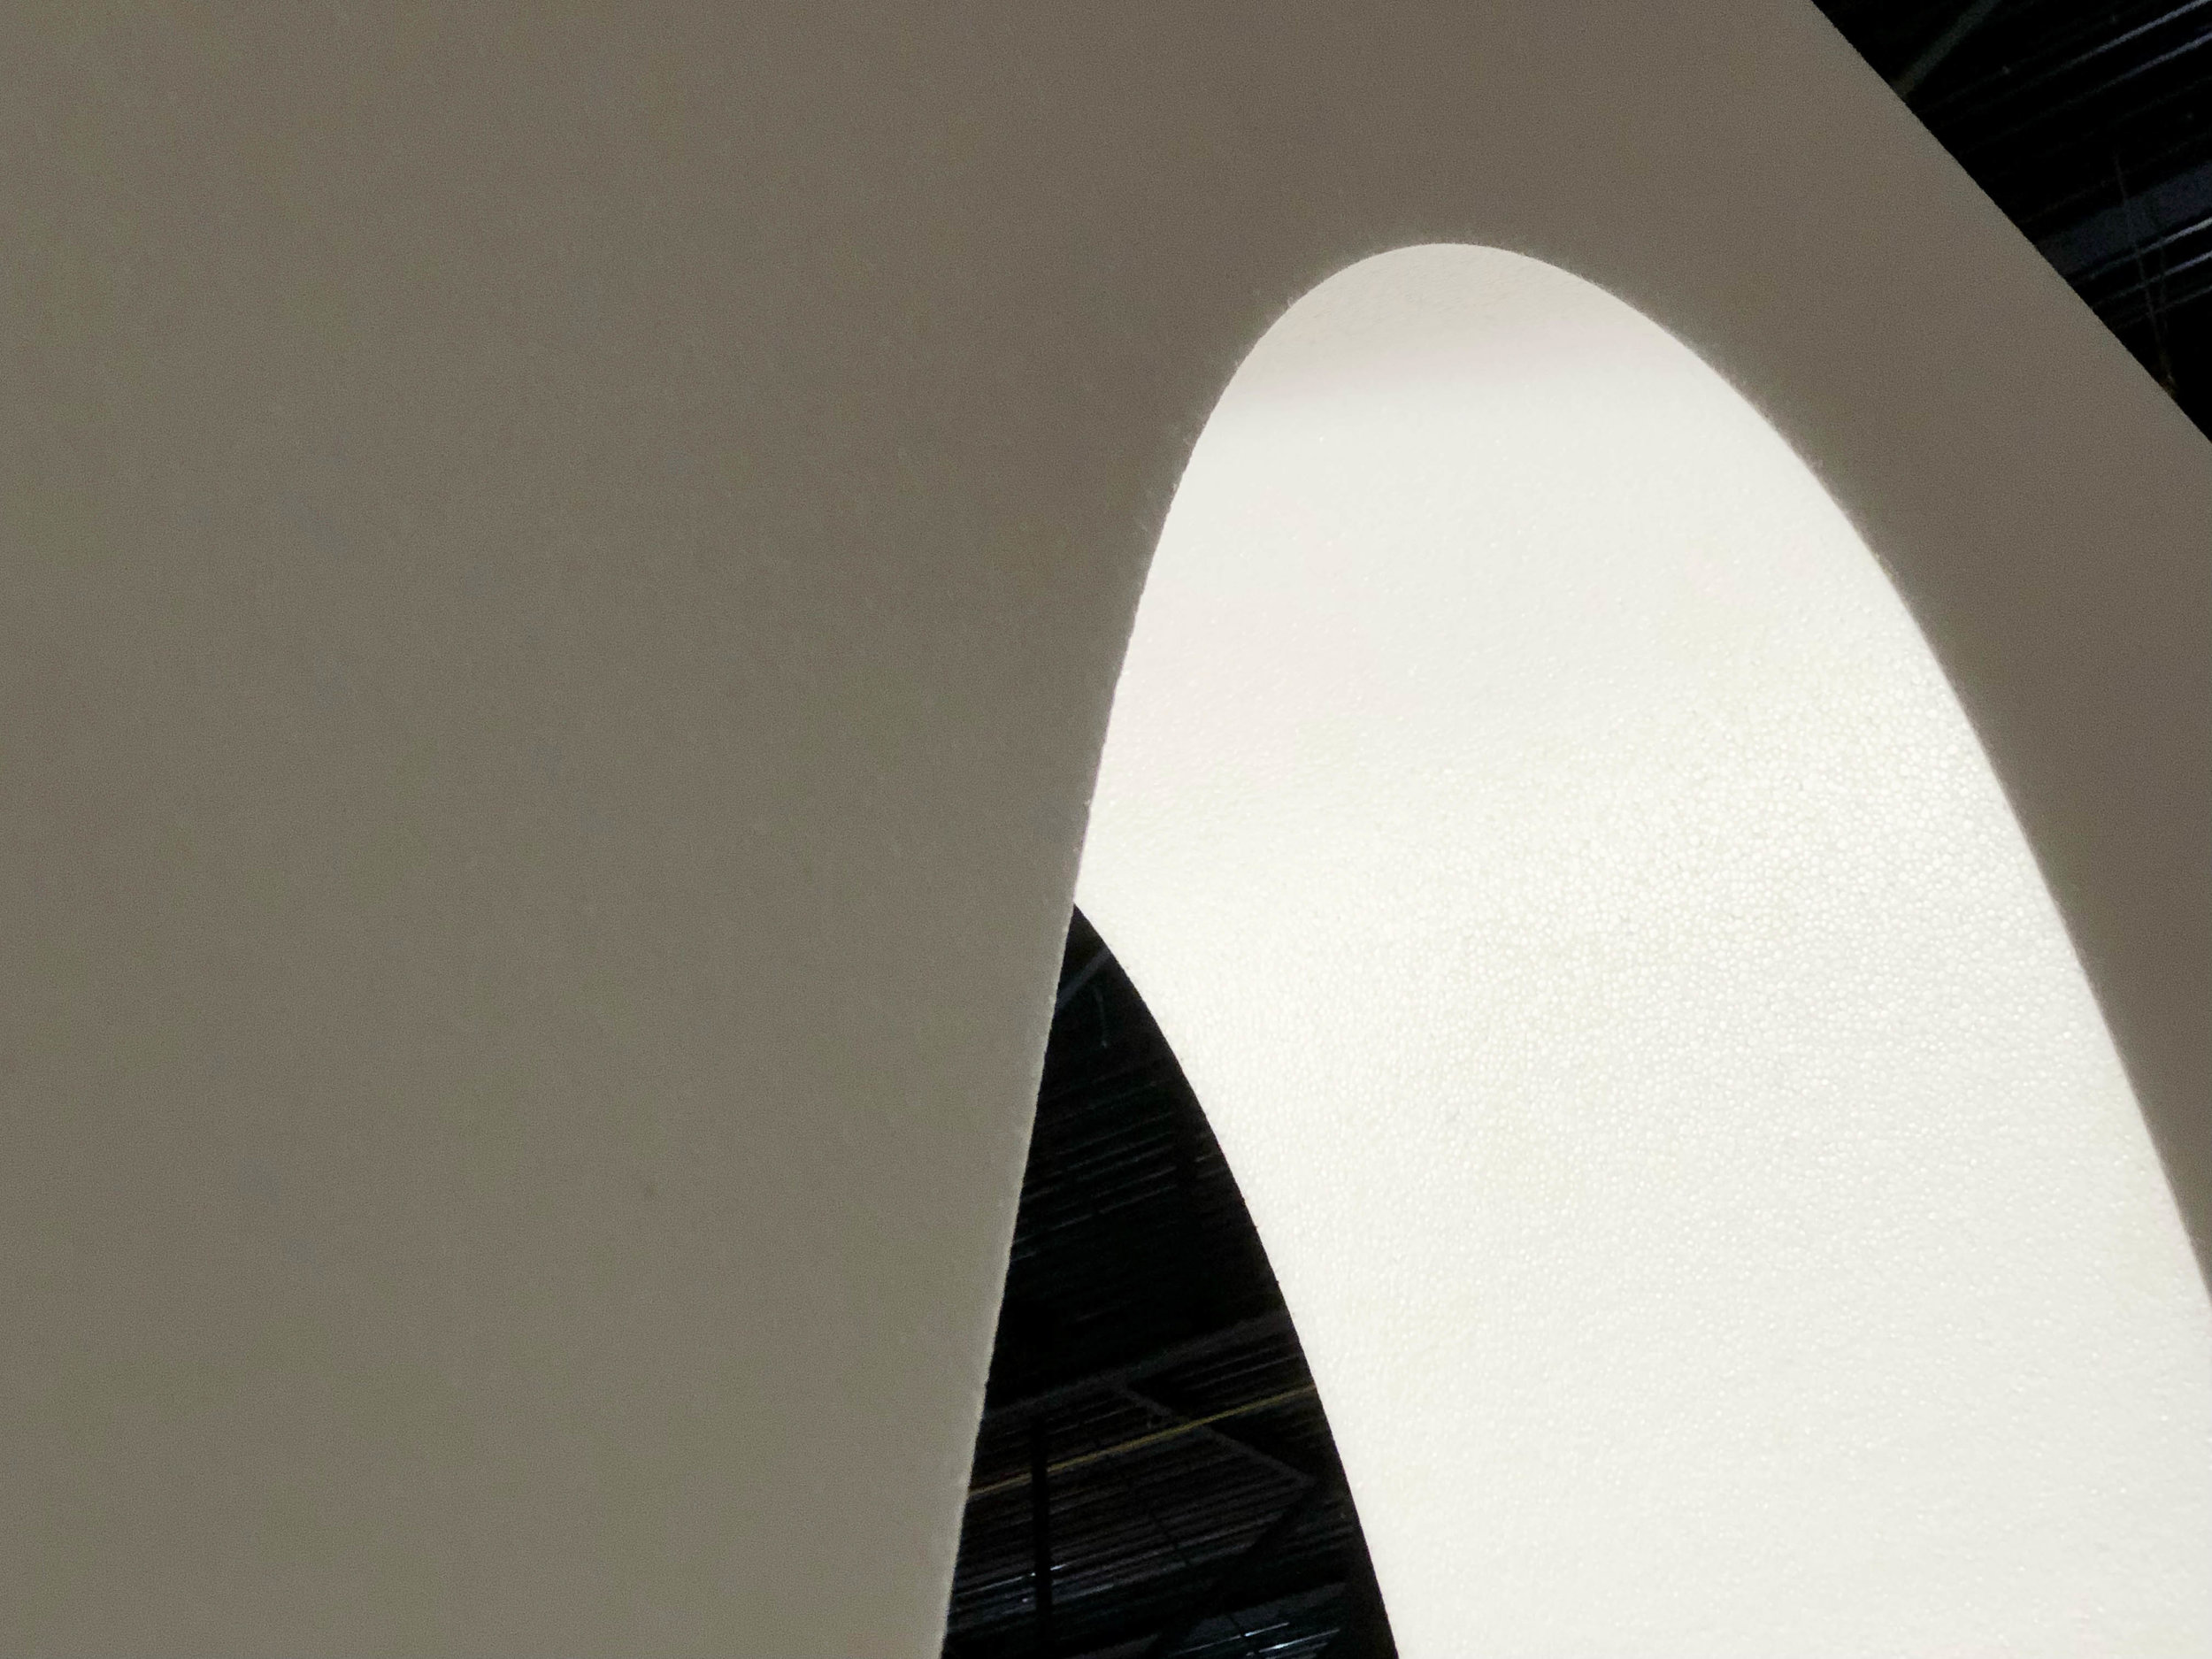 Raams-Architecture-Design-Studio-Geofood-Interieur-Biennale-Kortrijk-Belgium-design-award-restaurant-installation-exhibition-05s.jpg